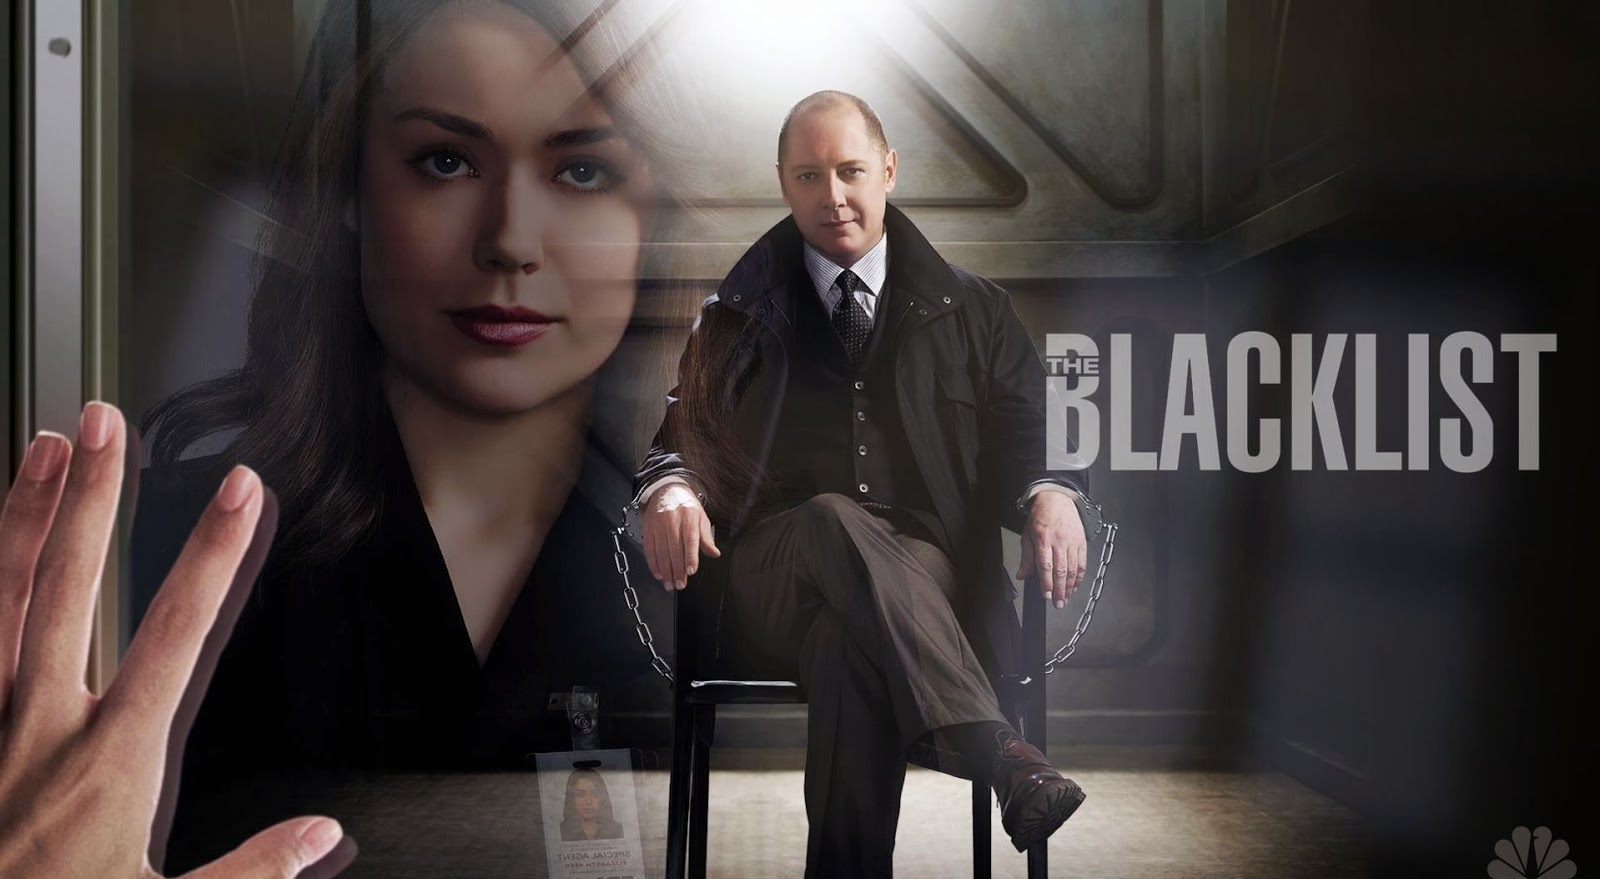 The Blacklist Episodenliste